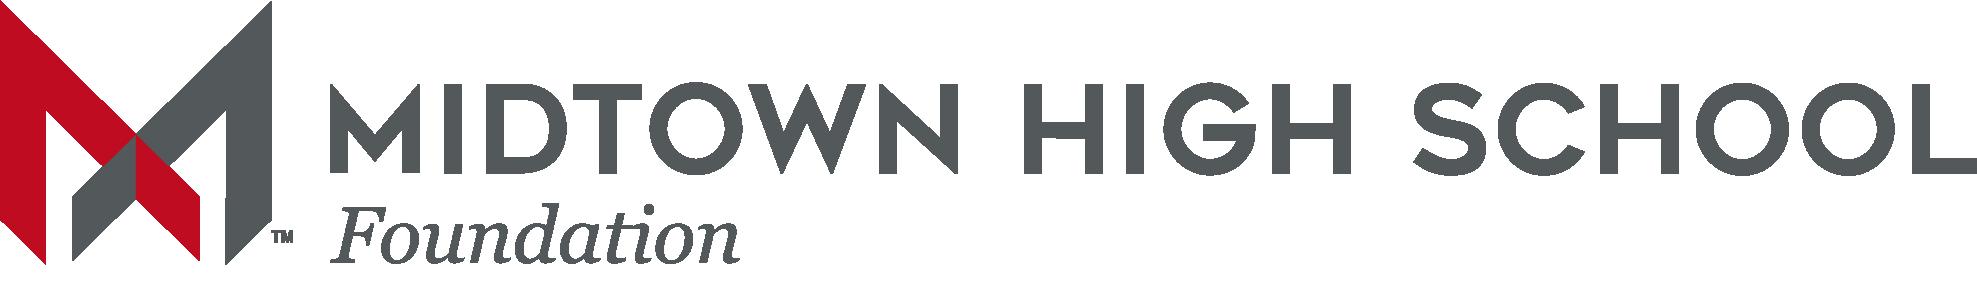 Midtown High School Foundation